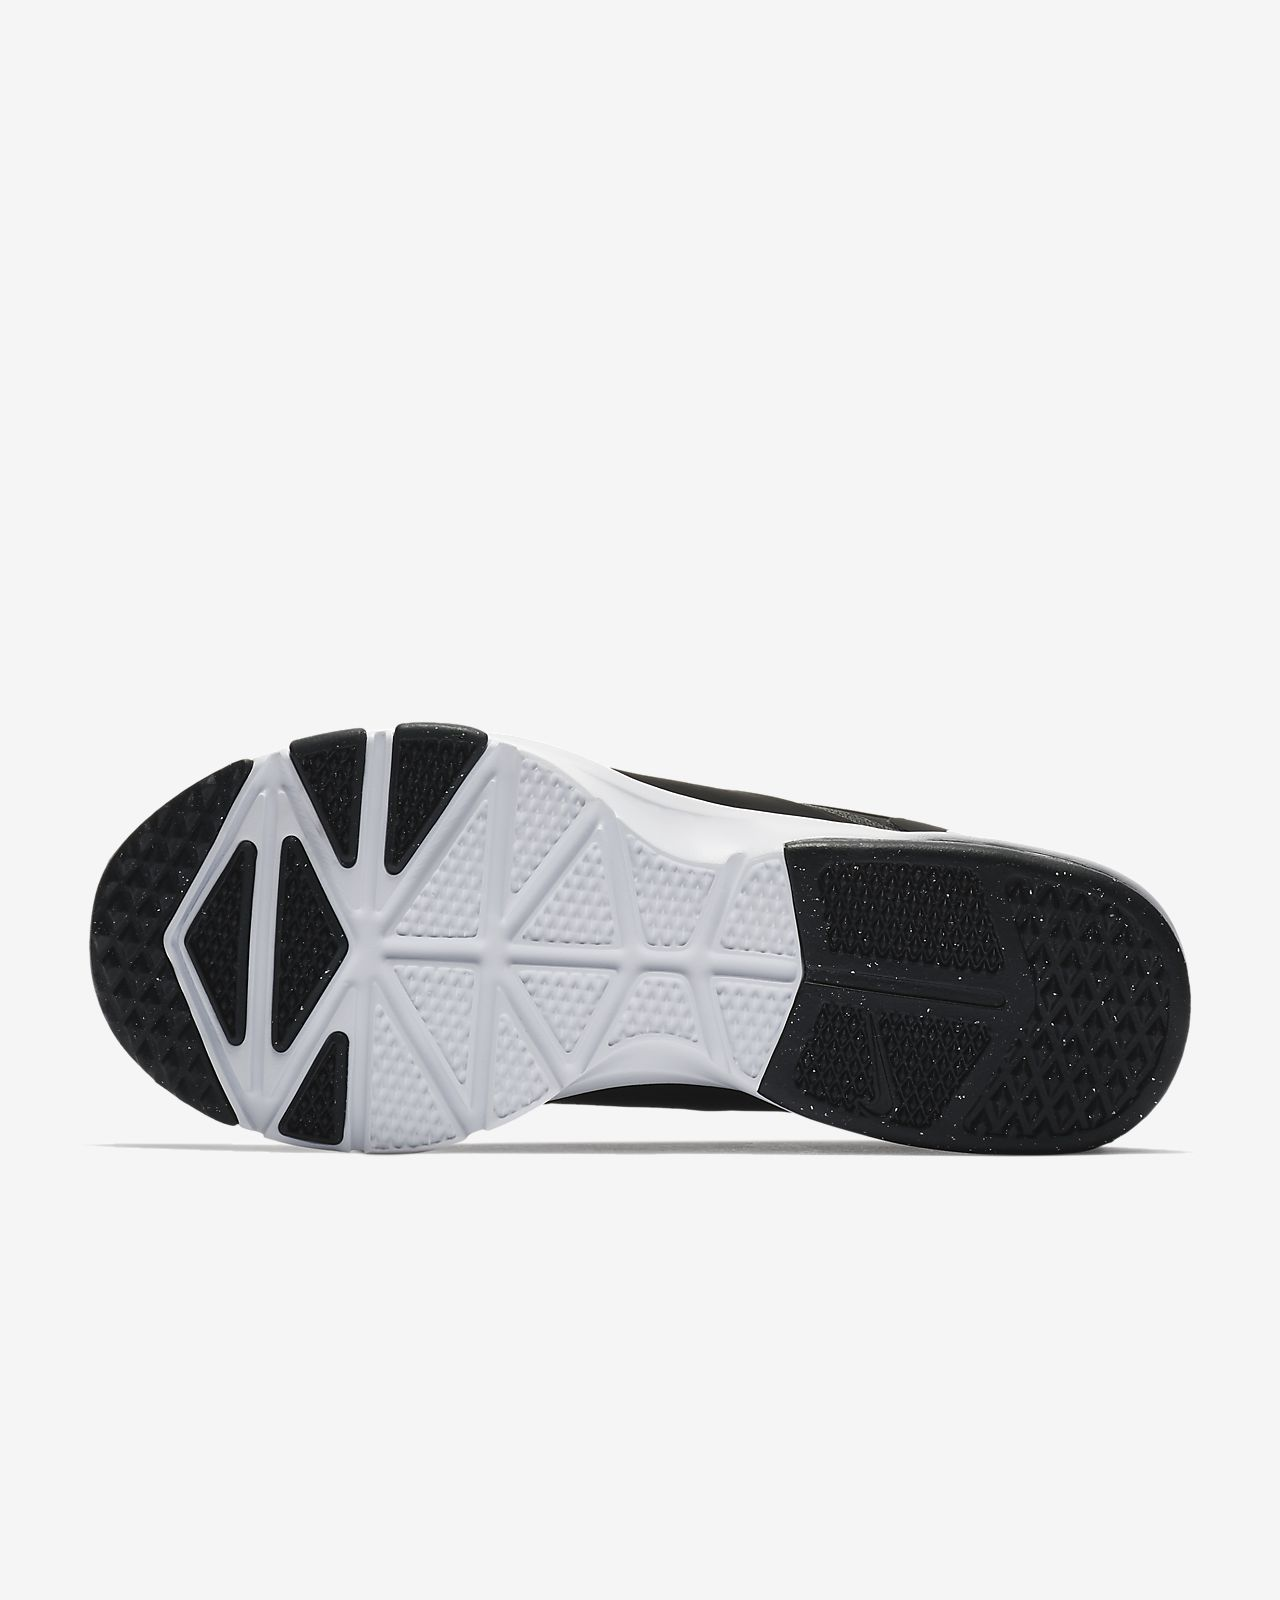 7520750906b Calzado de entrenamiento para mujer Nike Air Bella TR. Nike.com MX